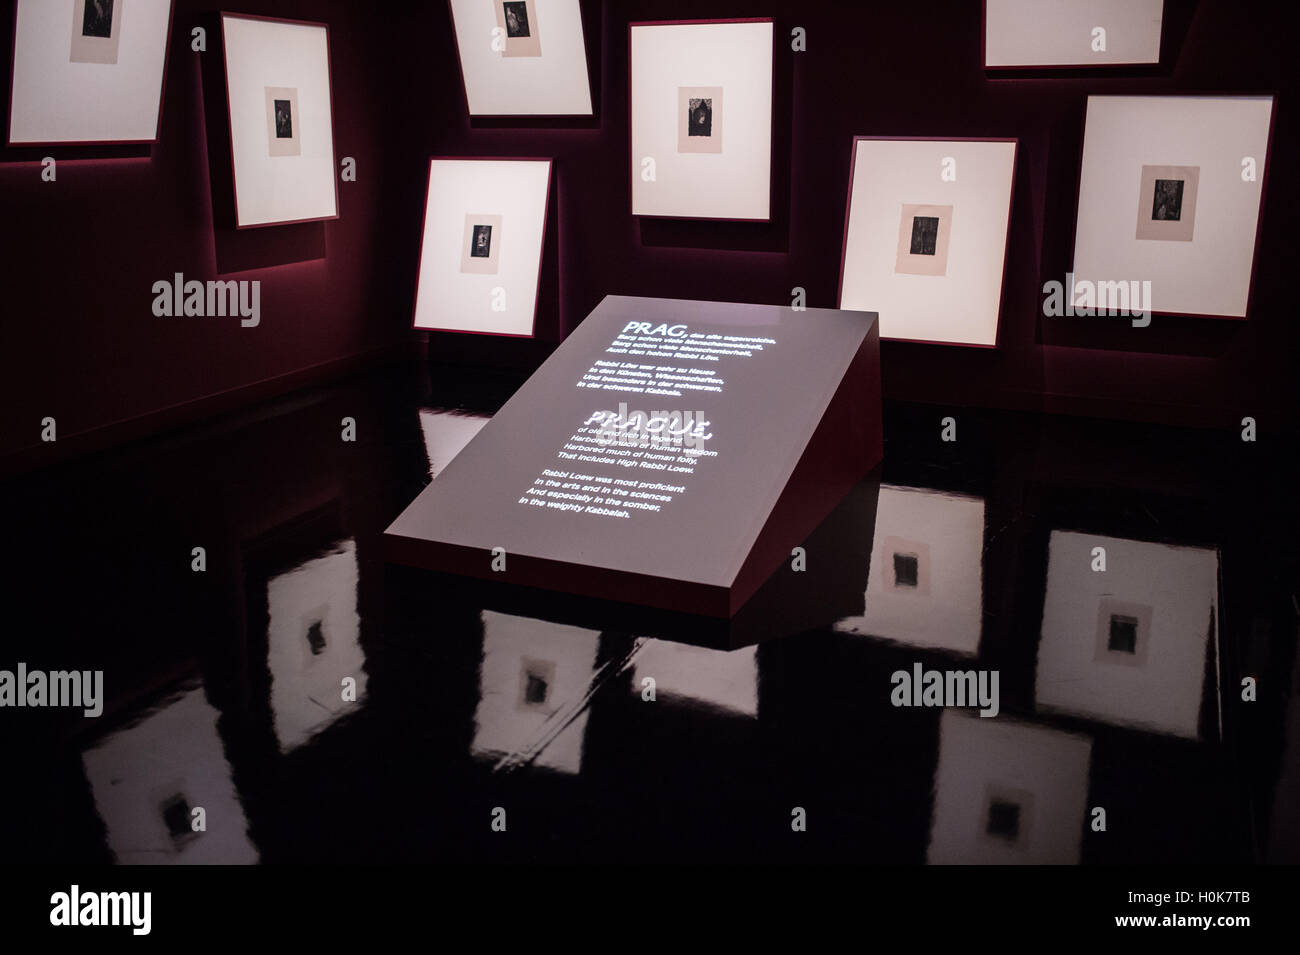 Phantasien Stockfotos & Phantasien Bilder - Alamy